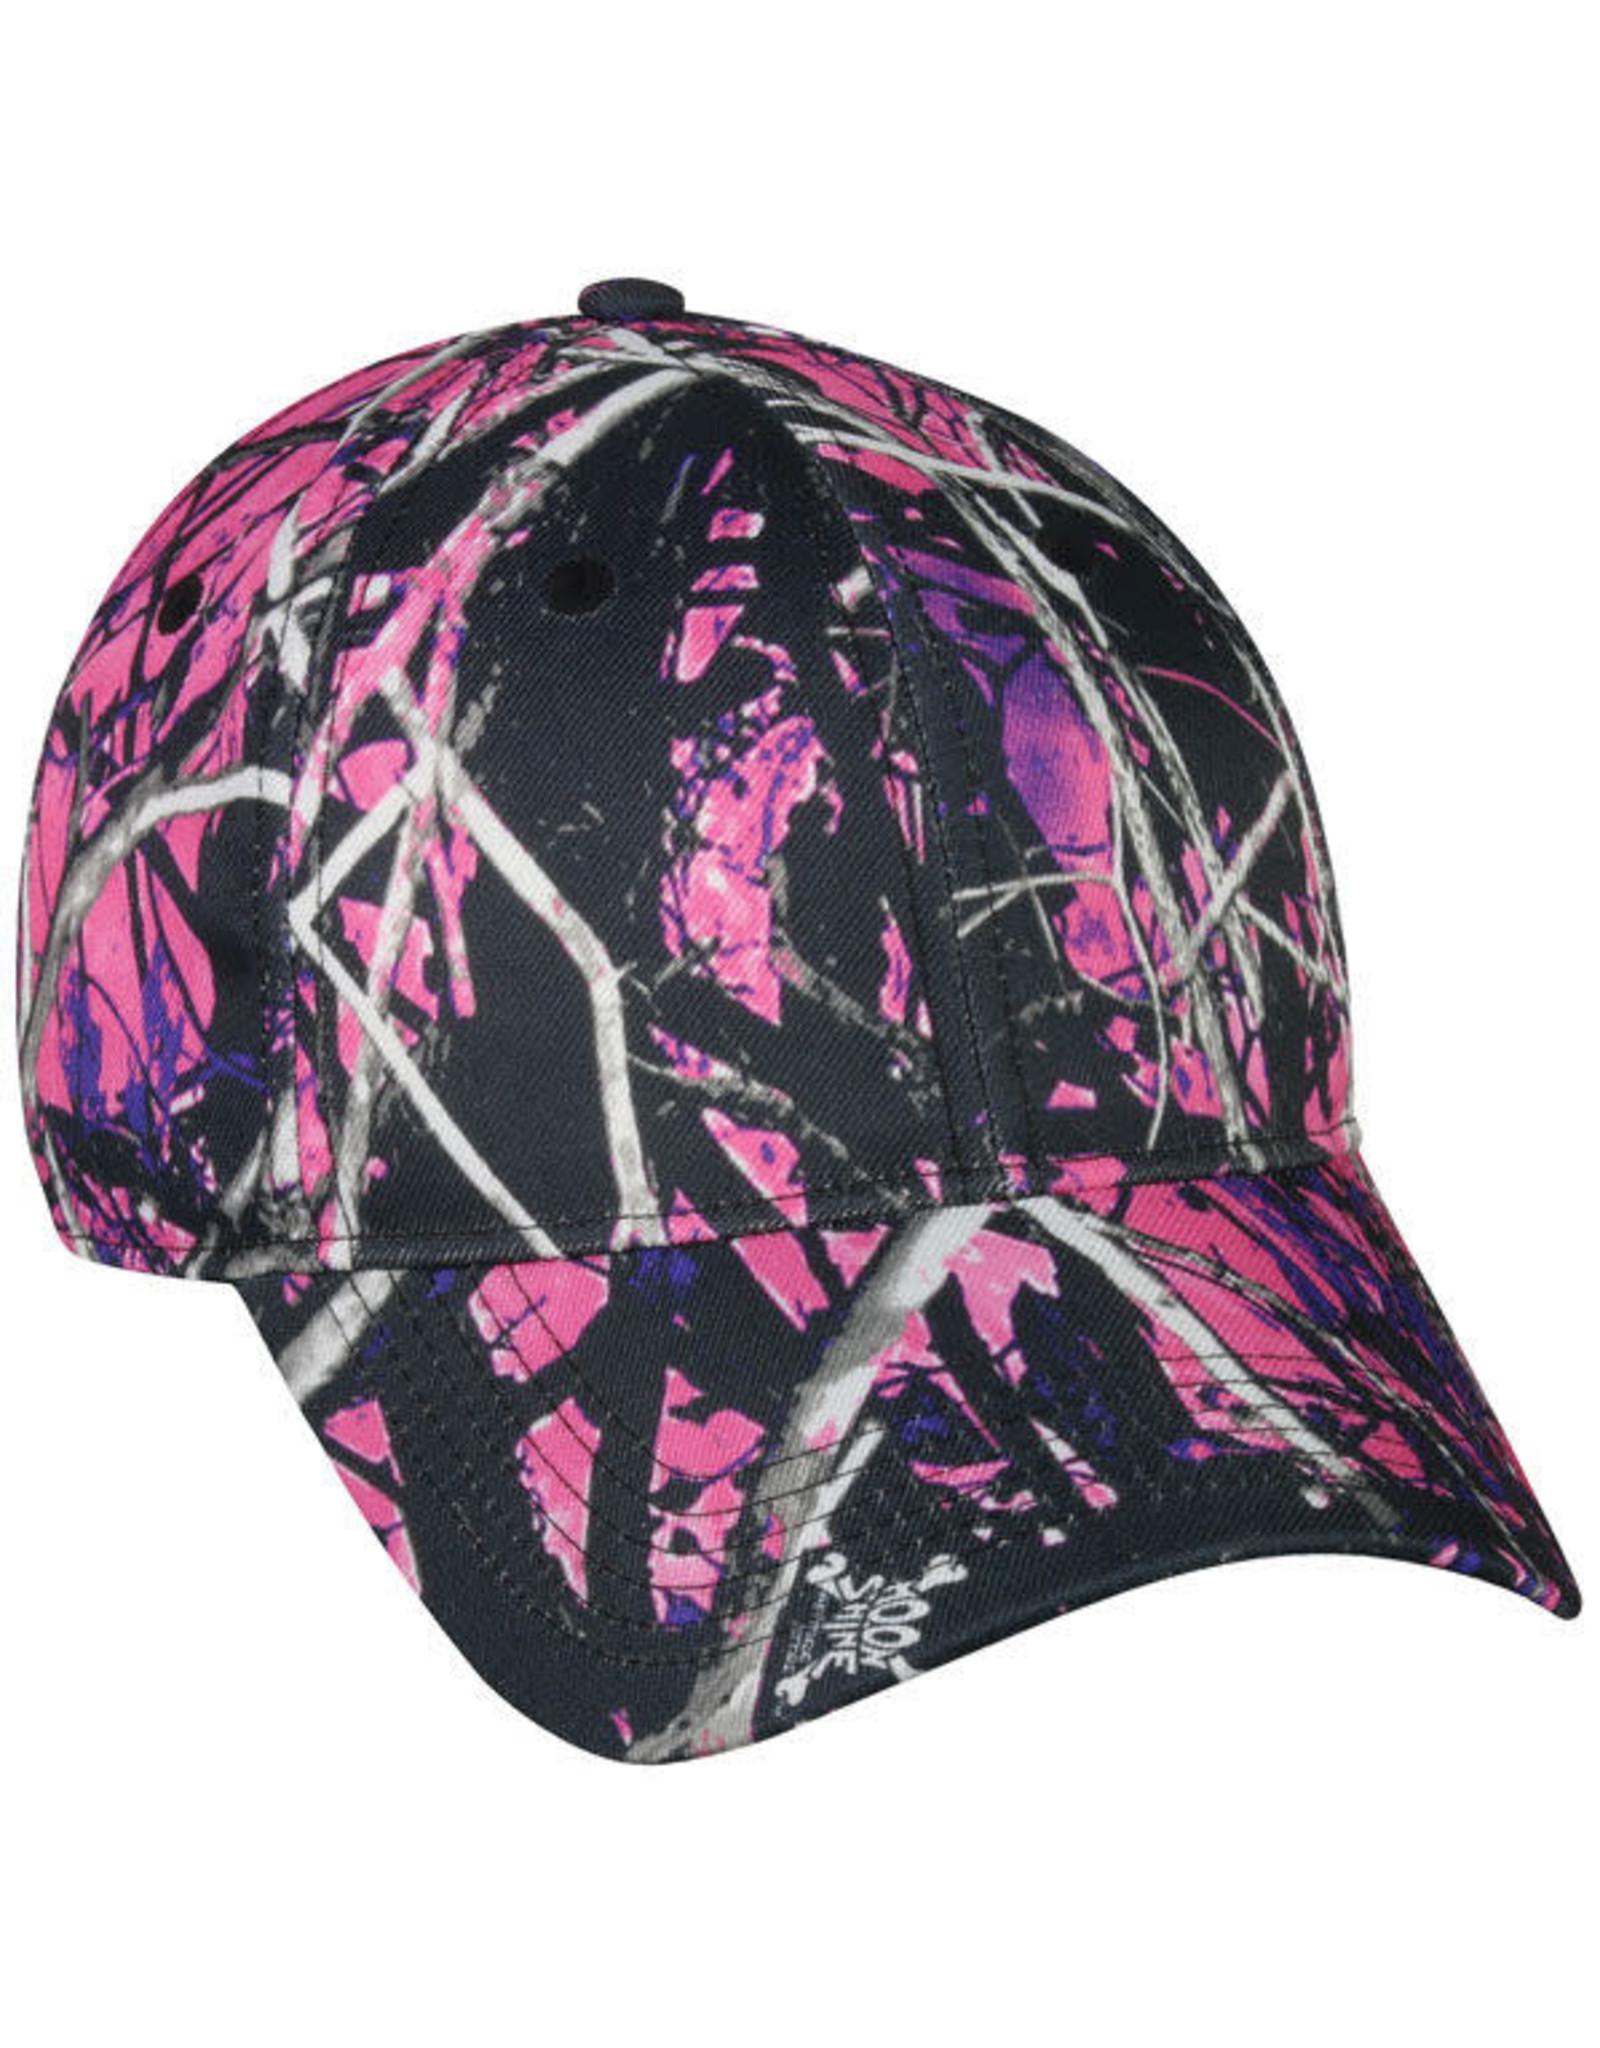 Outdoor Muddy Girl Ladies Hat